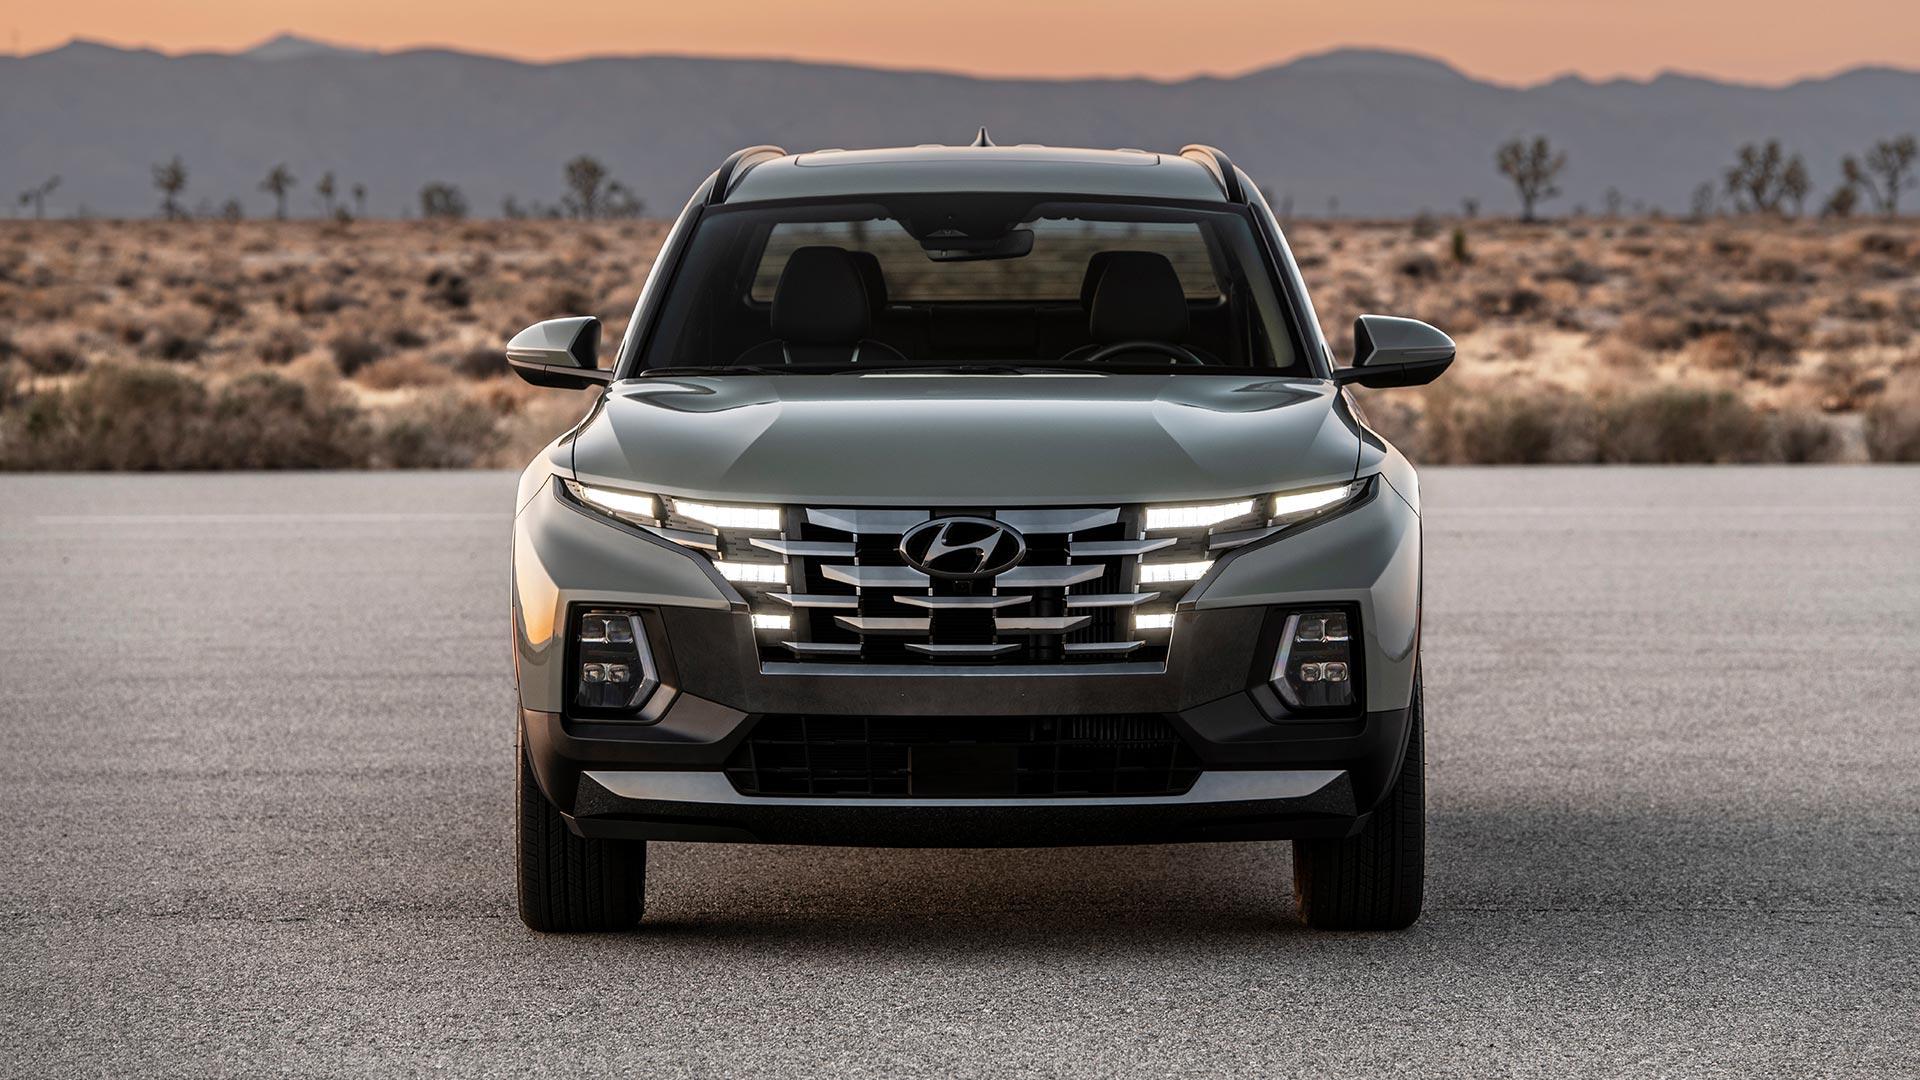 Hyundai Santa Cruz Front View